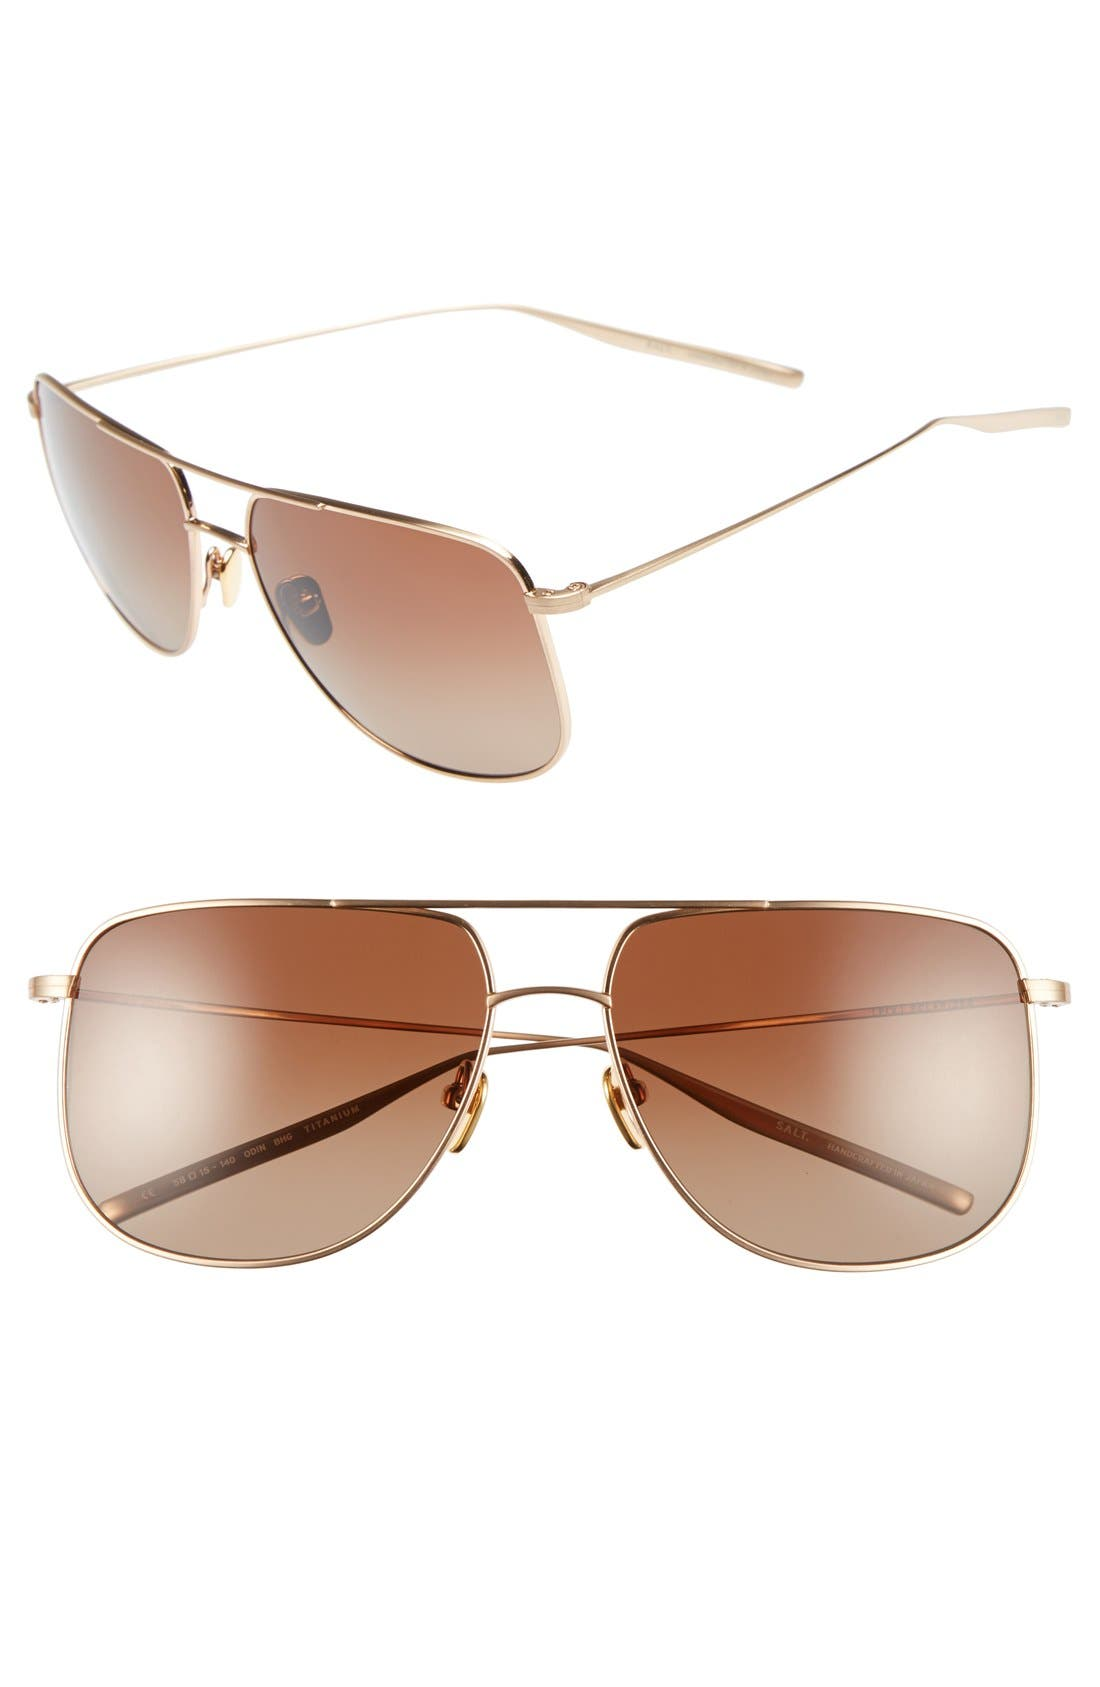 SALT 'Odin' 58mm Polarized Sunglasses